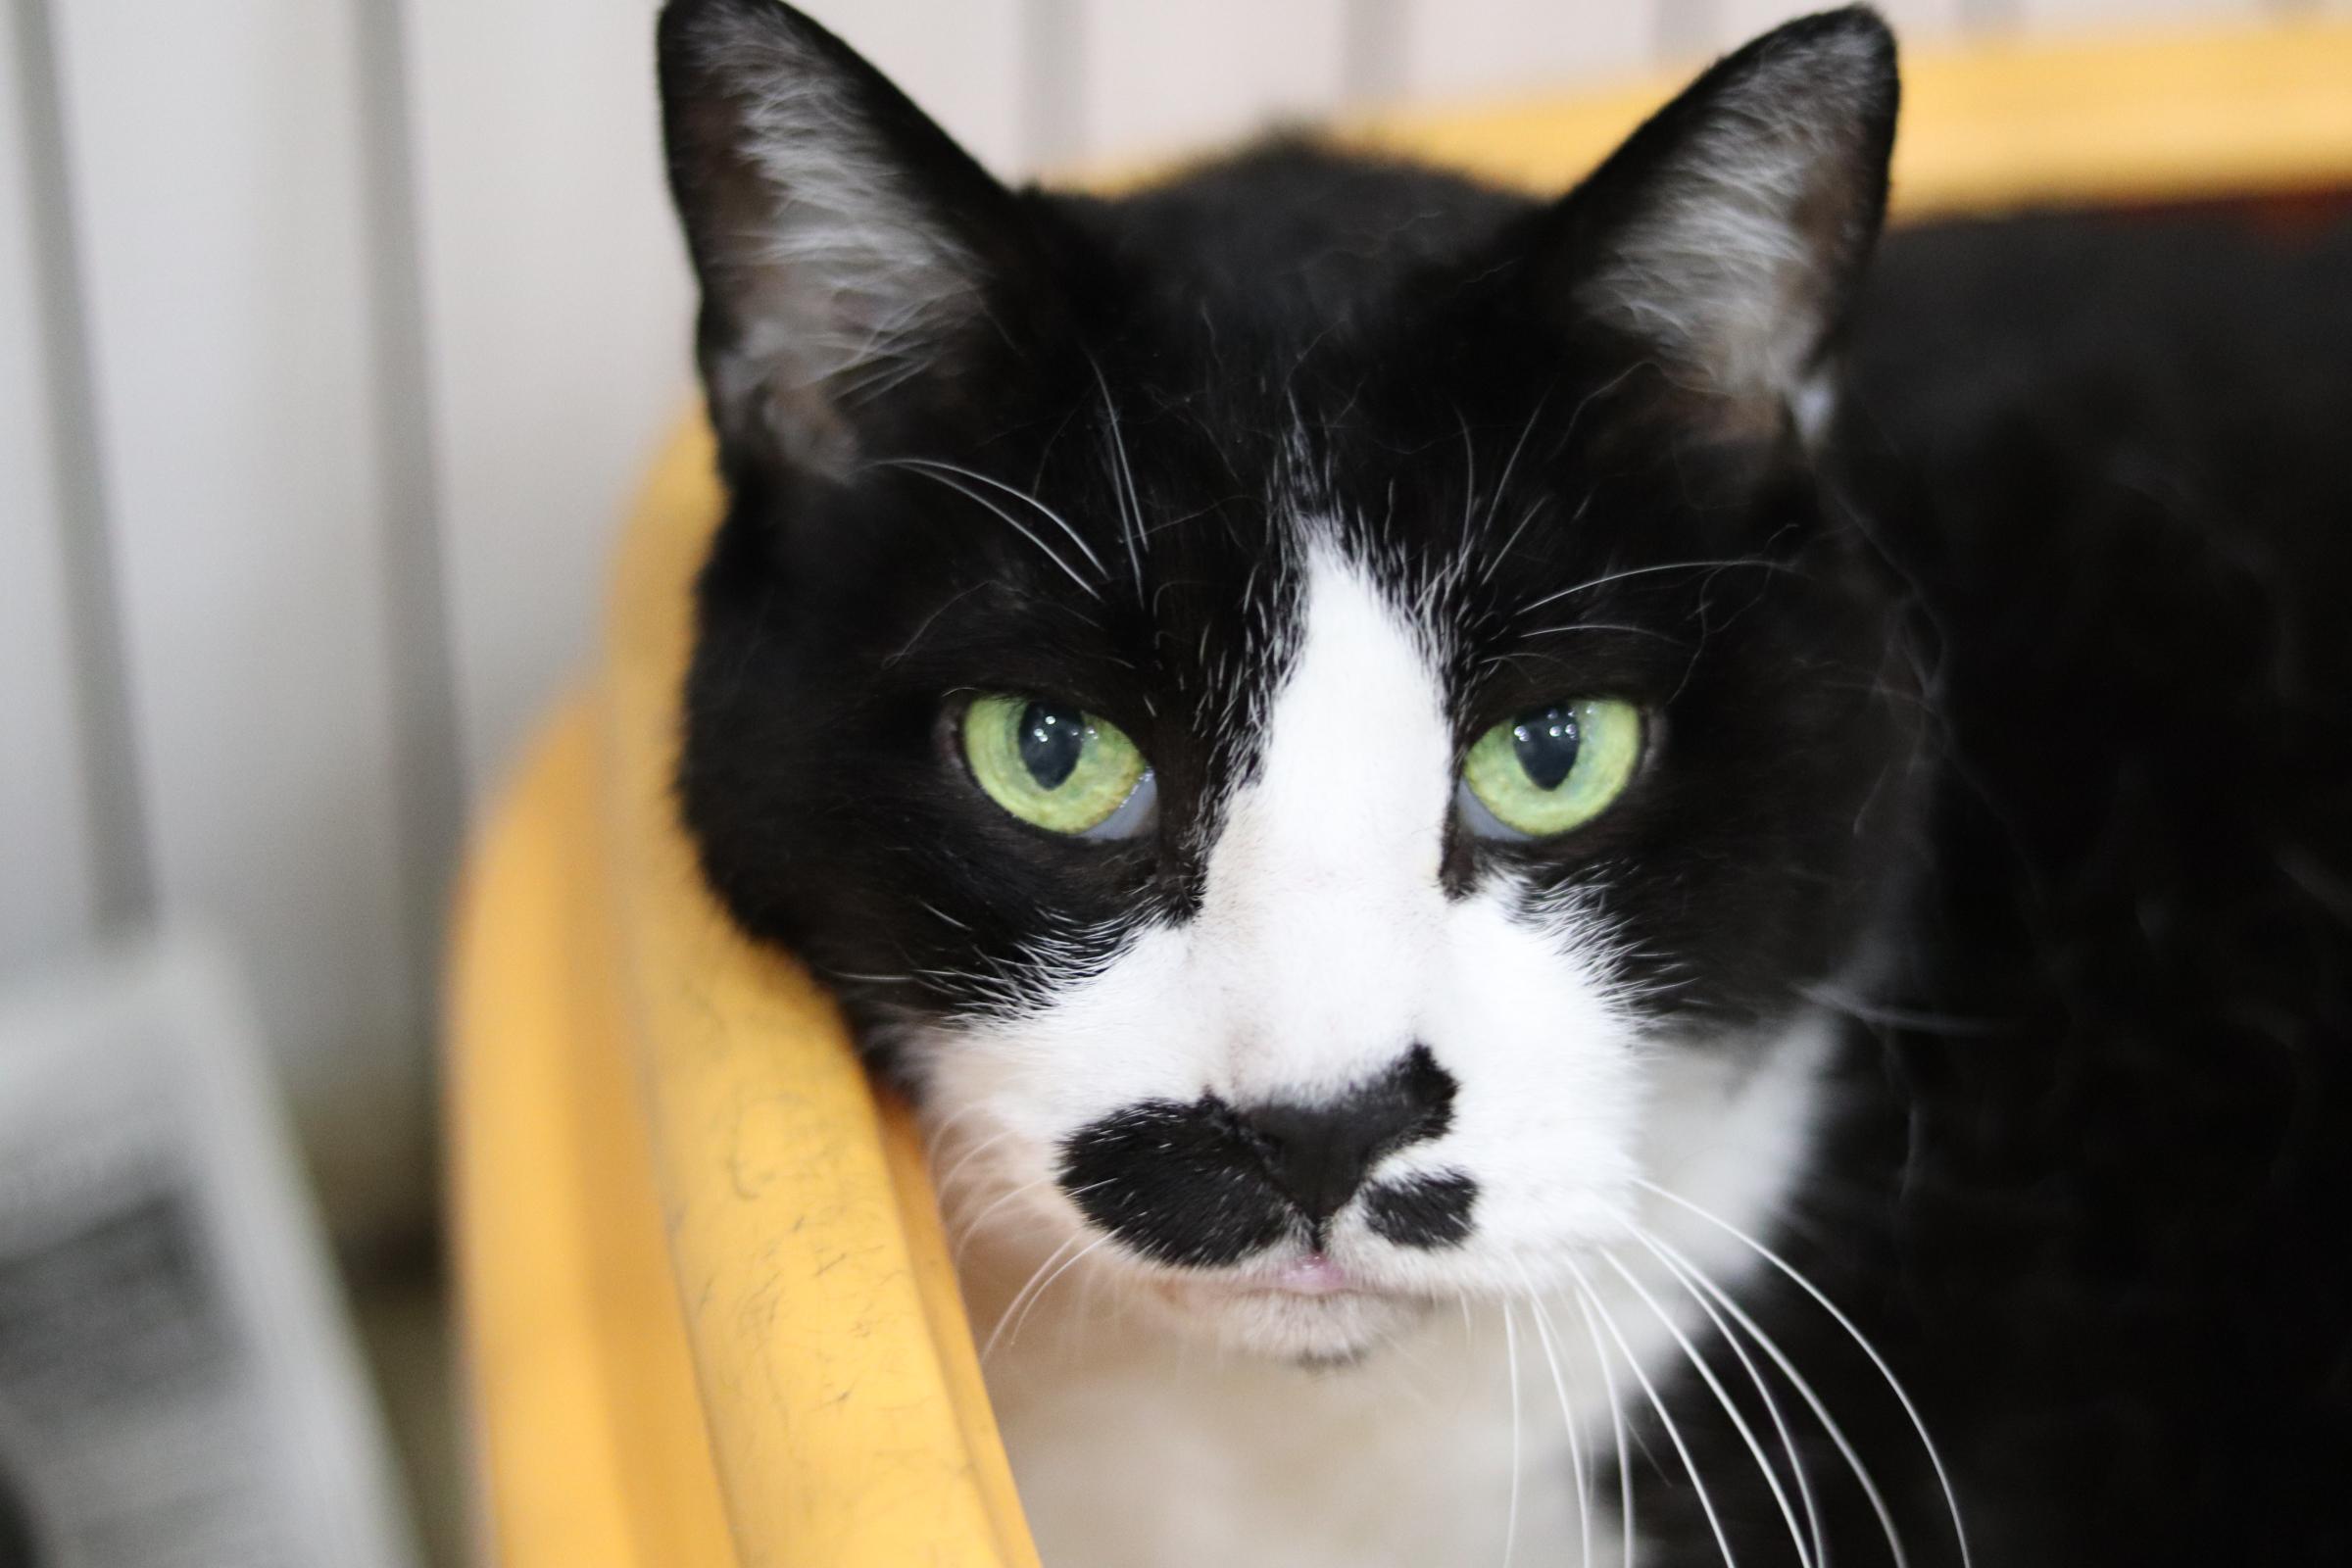 <ul> <li>猫種:日本猫</li> <li>性別:男の子</li> <li>名前:きよし</li> <li>年齢:2006年7月27日生まれ</li> <li>保護経緯:離婚のため飼育困難</li> </ul>